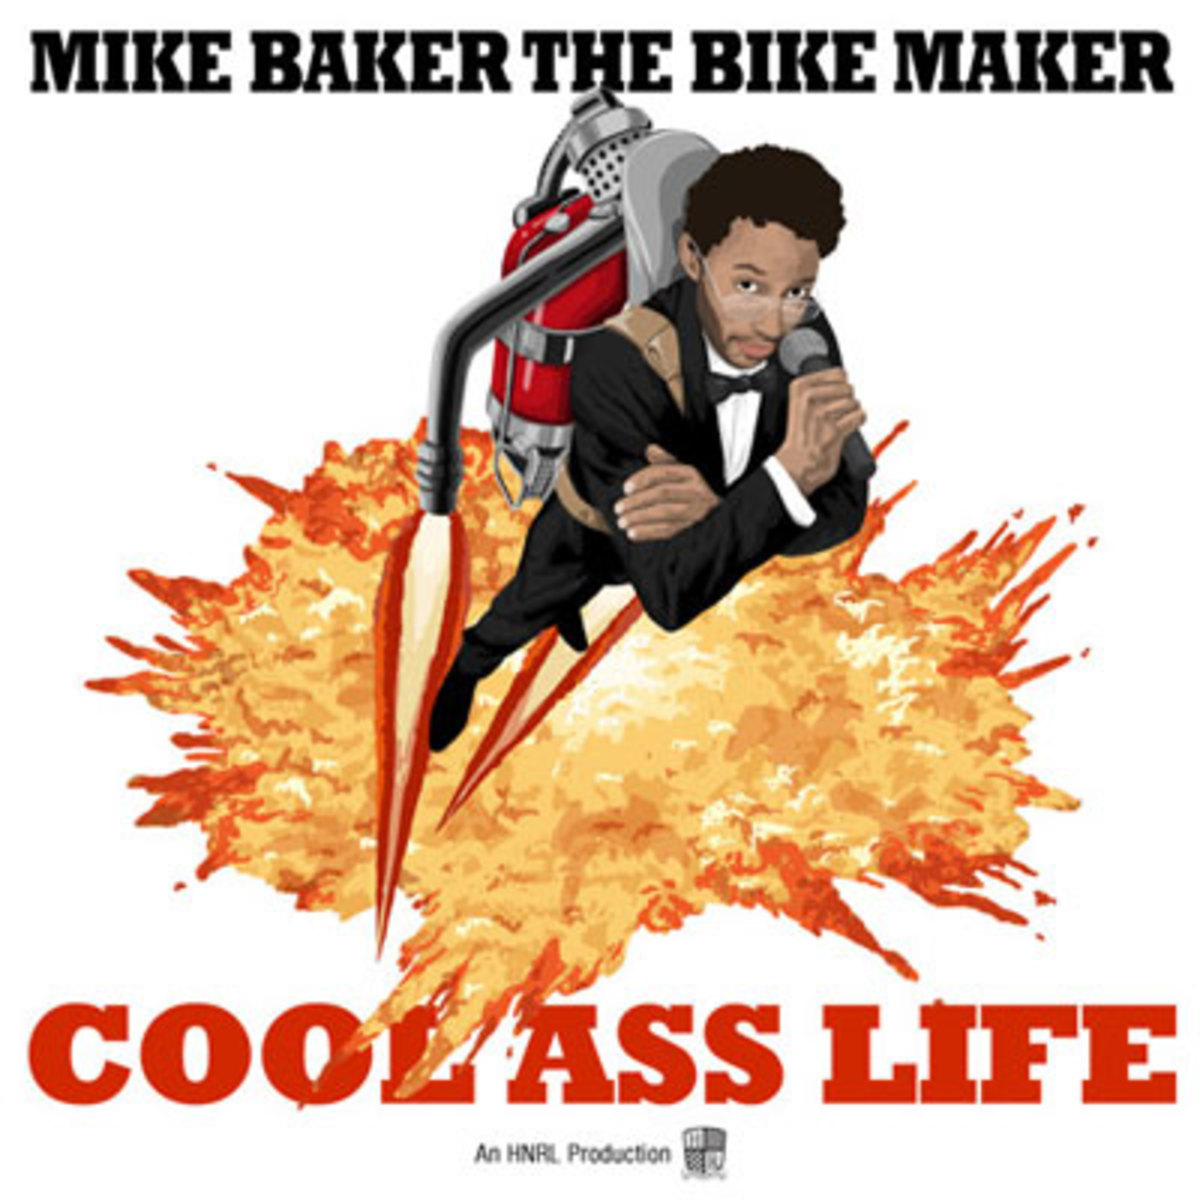 mike-baker-the-bike-maker-cool-ass-life.jpg